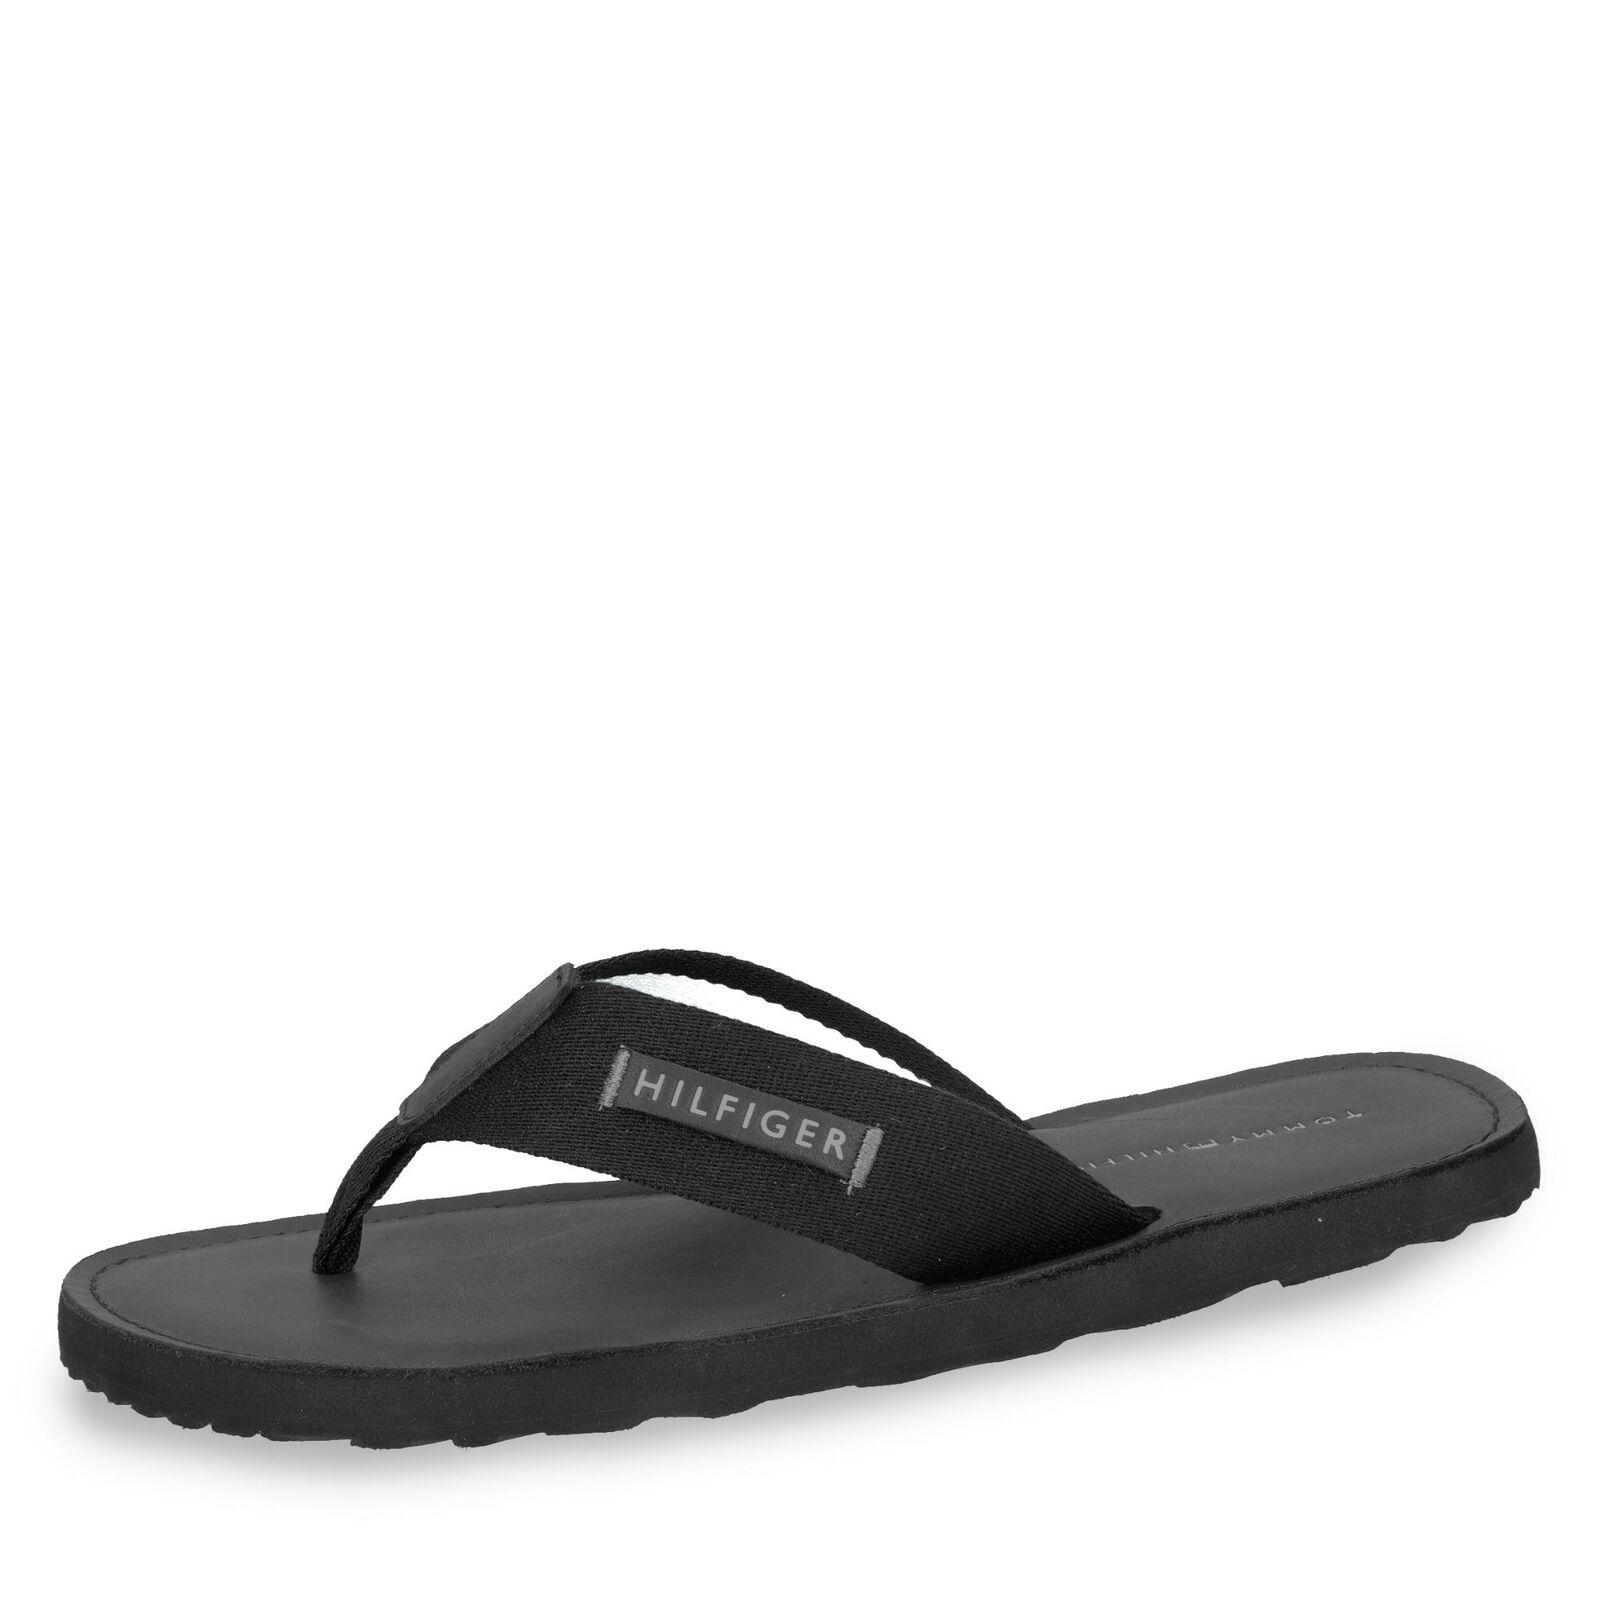 T. Hilfiger Herren Pantolette Zehentrenner Komfortschuhe Uni Sandale Schuhe